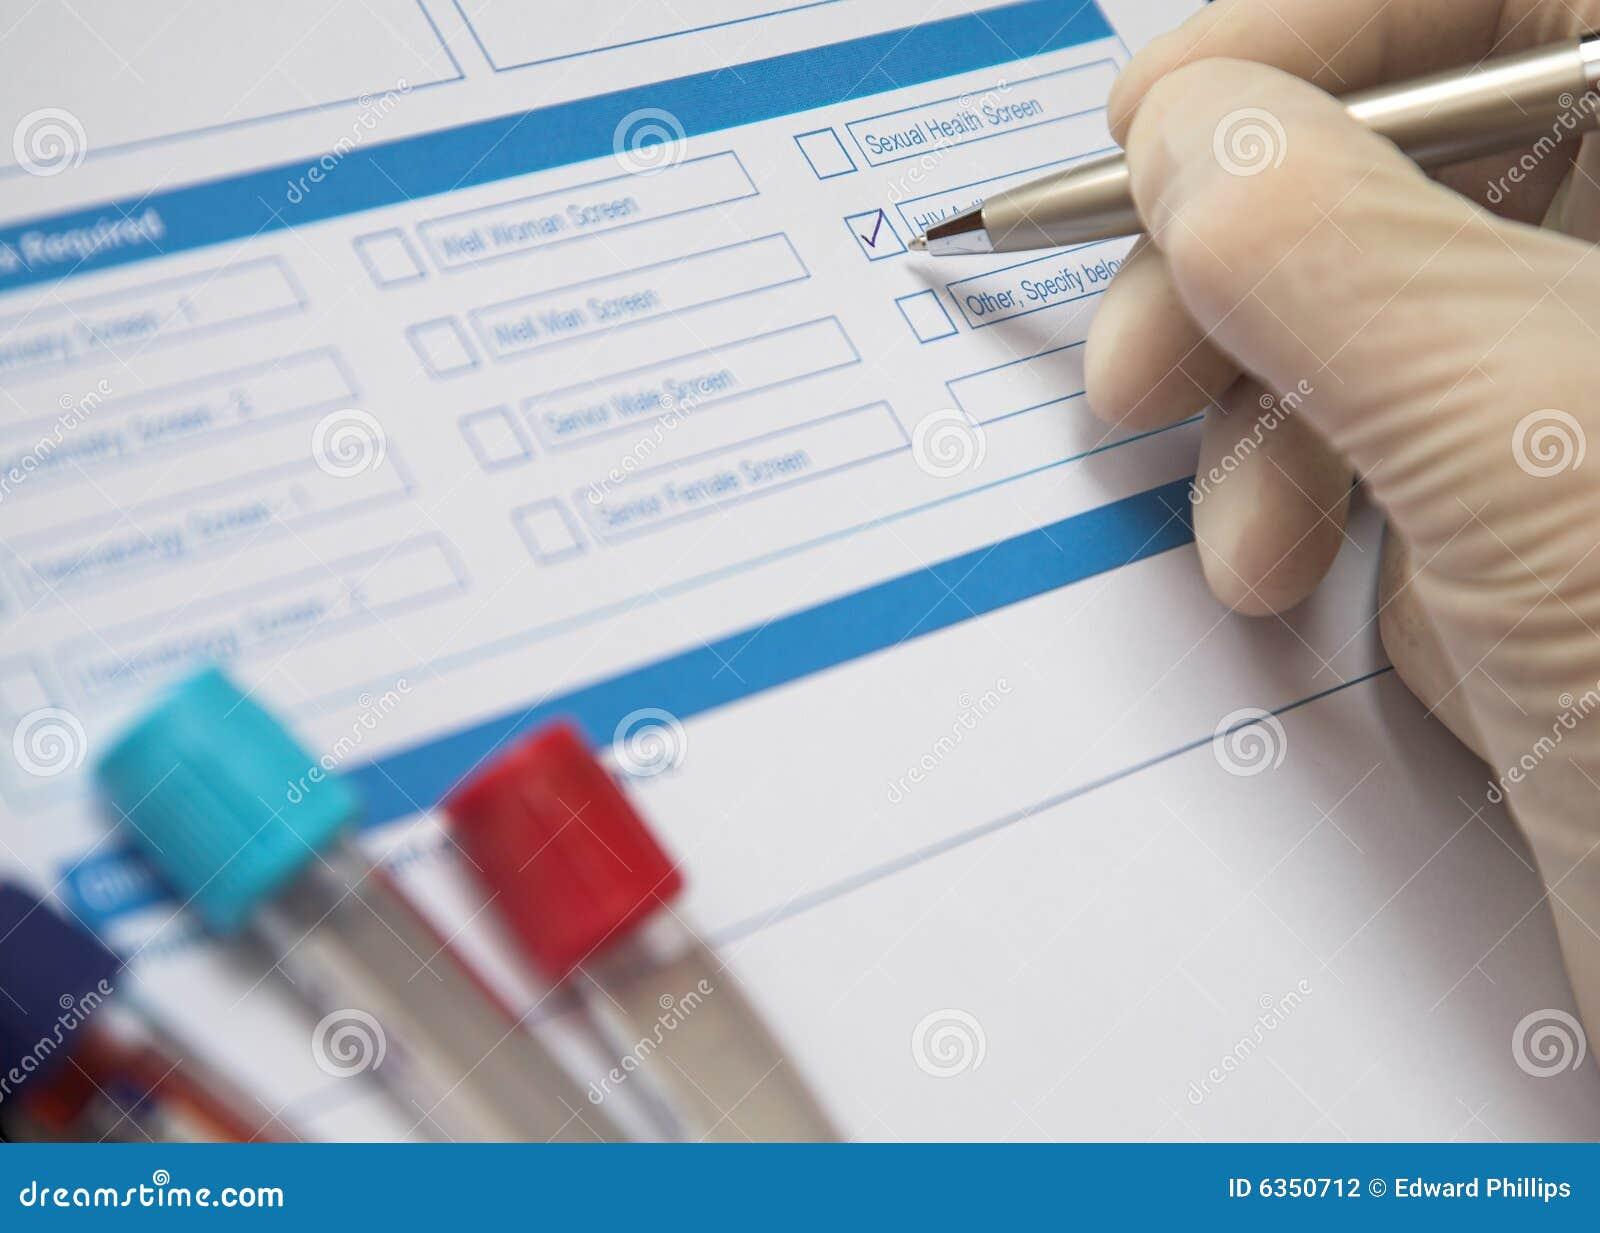 Doctor Completing a Blood Test Form